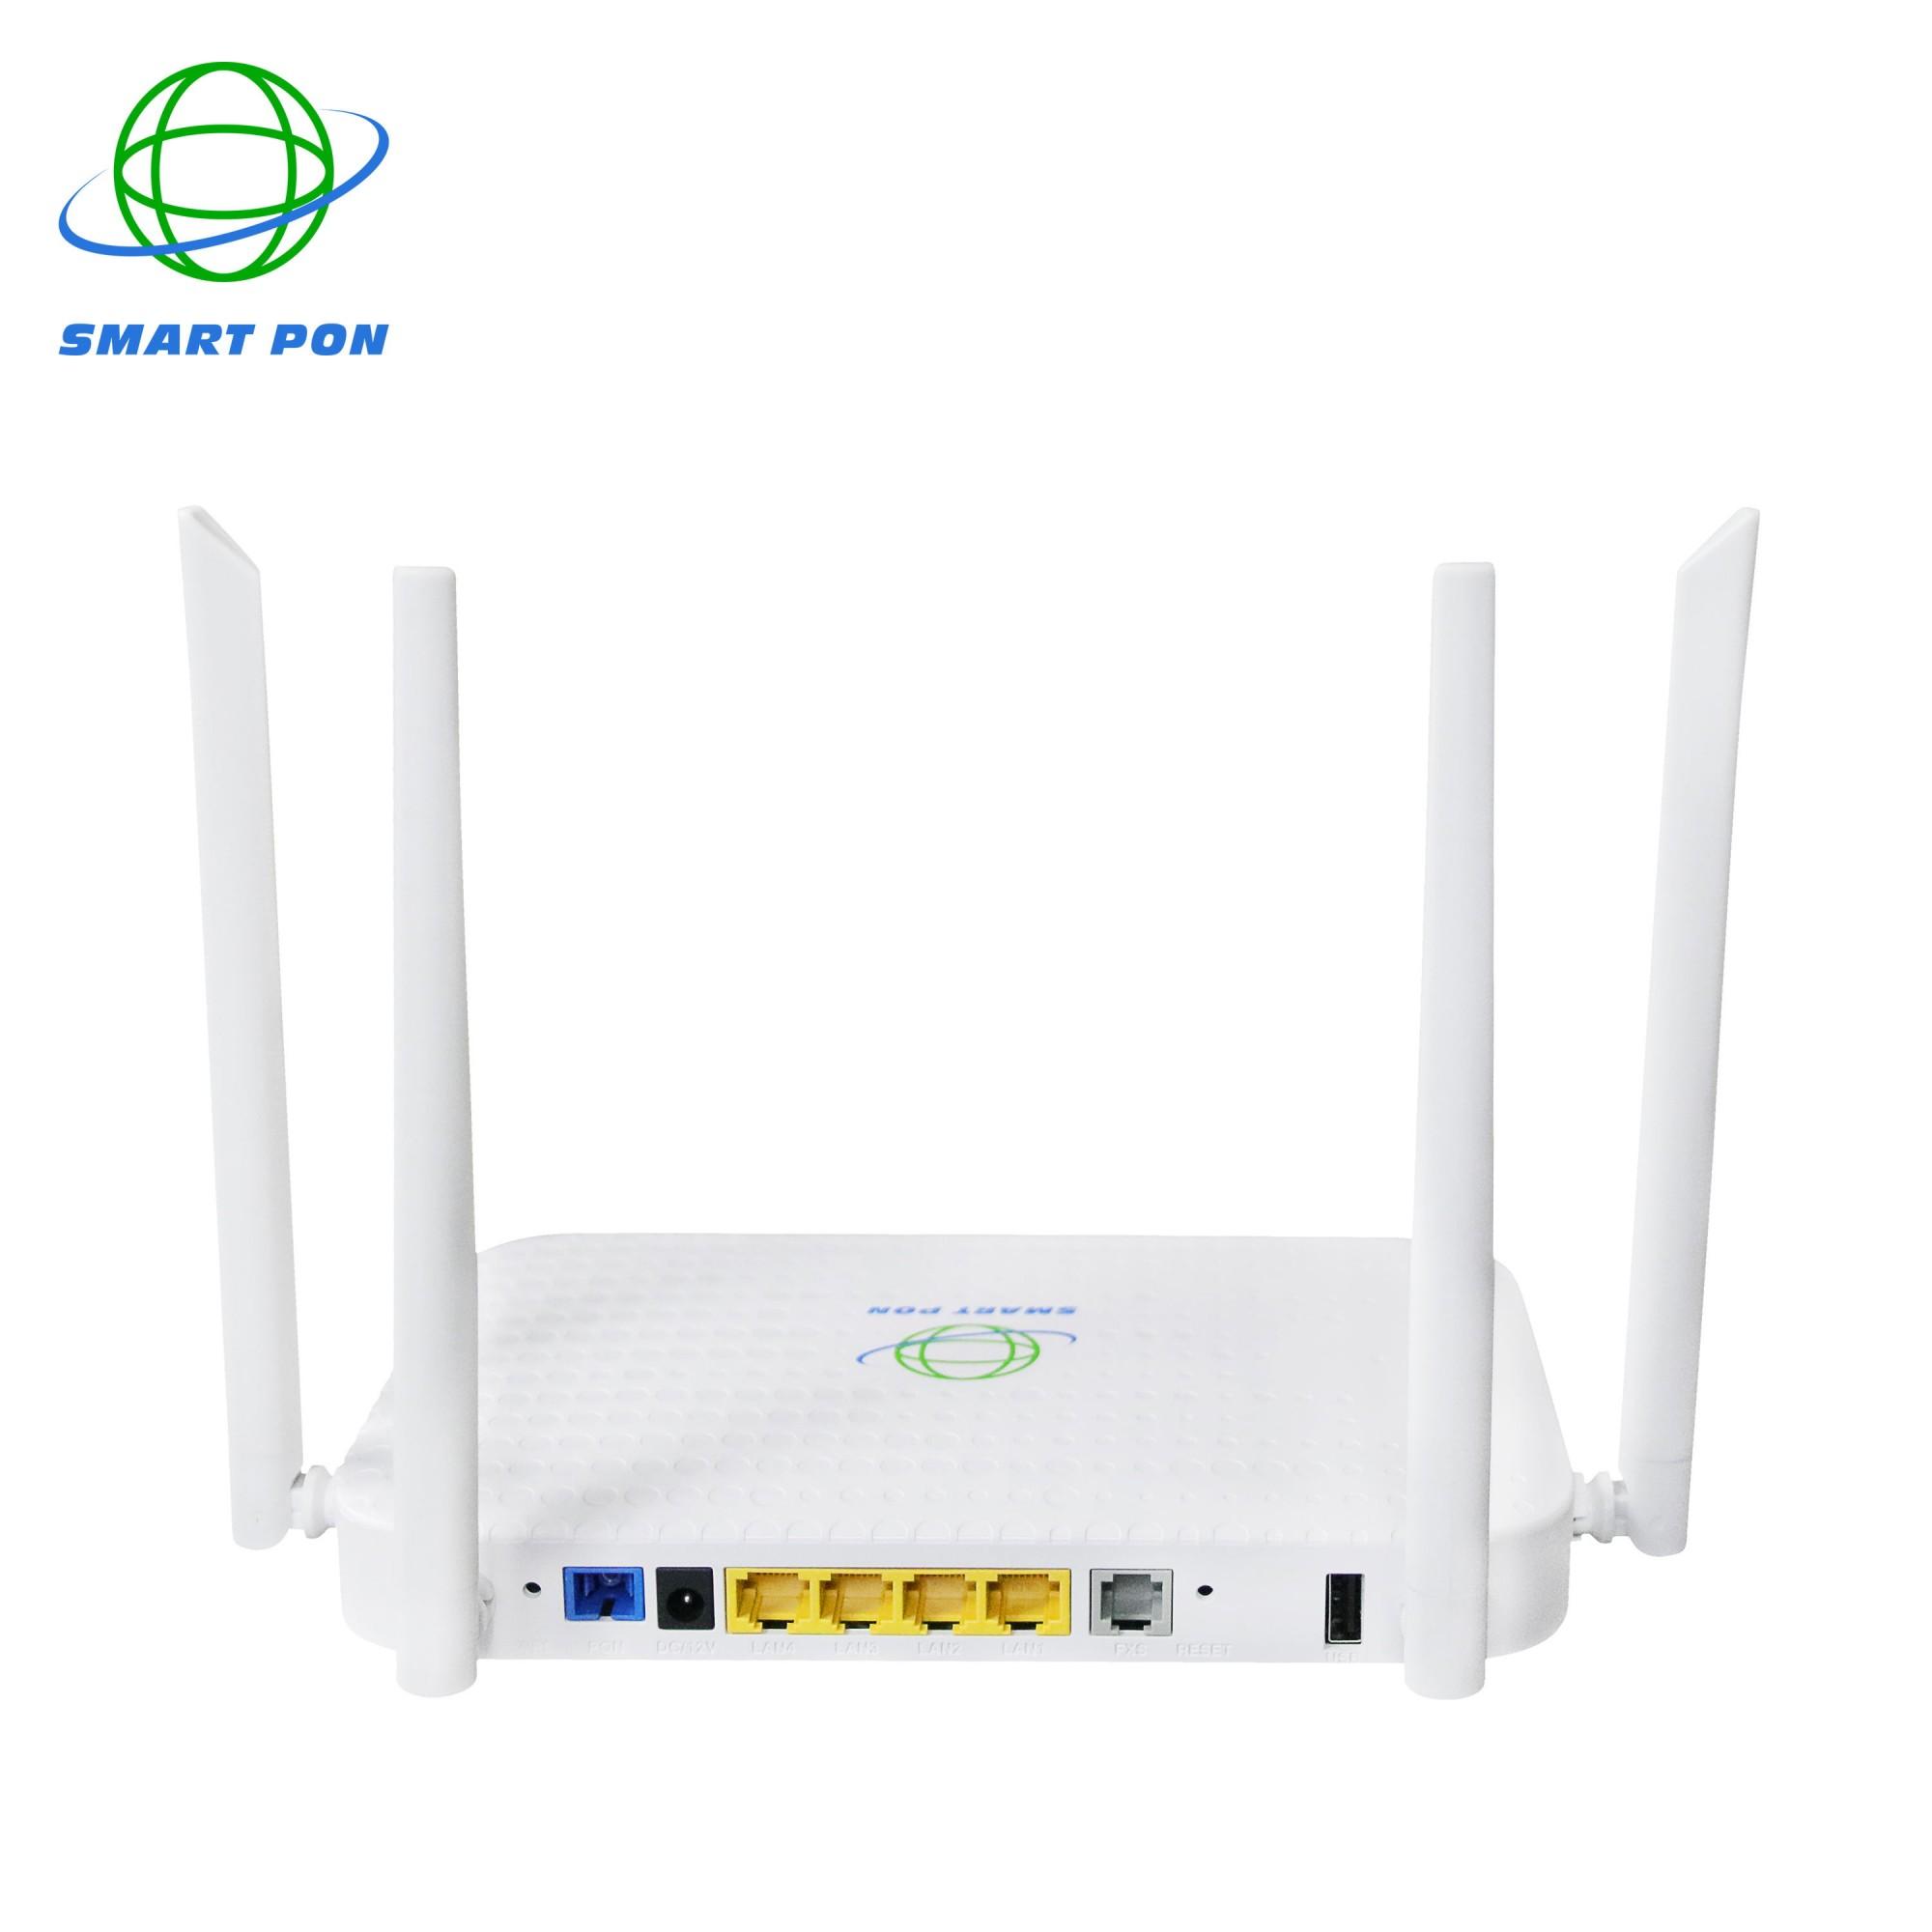 4GE + WiFi + 1USB + Voice XPON ONU